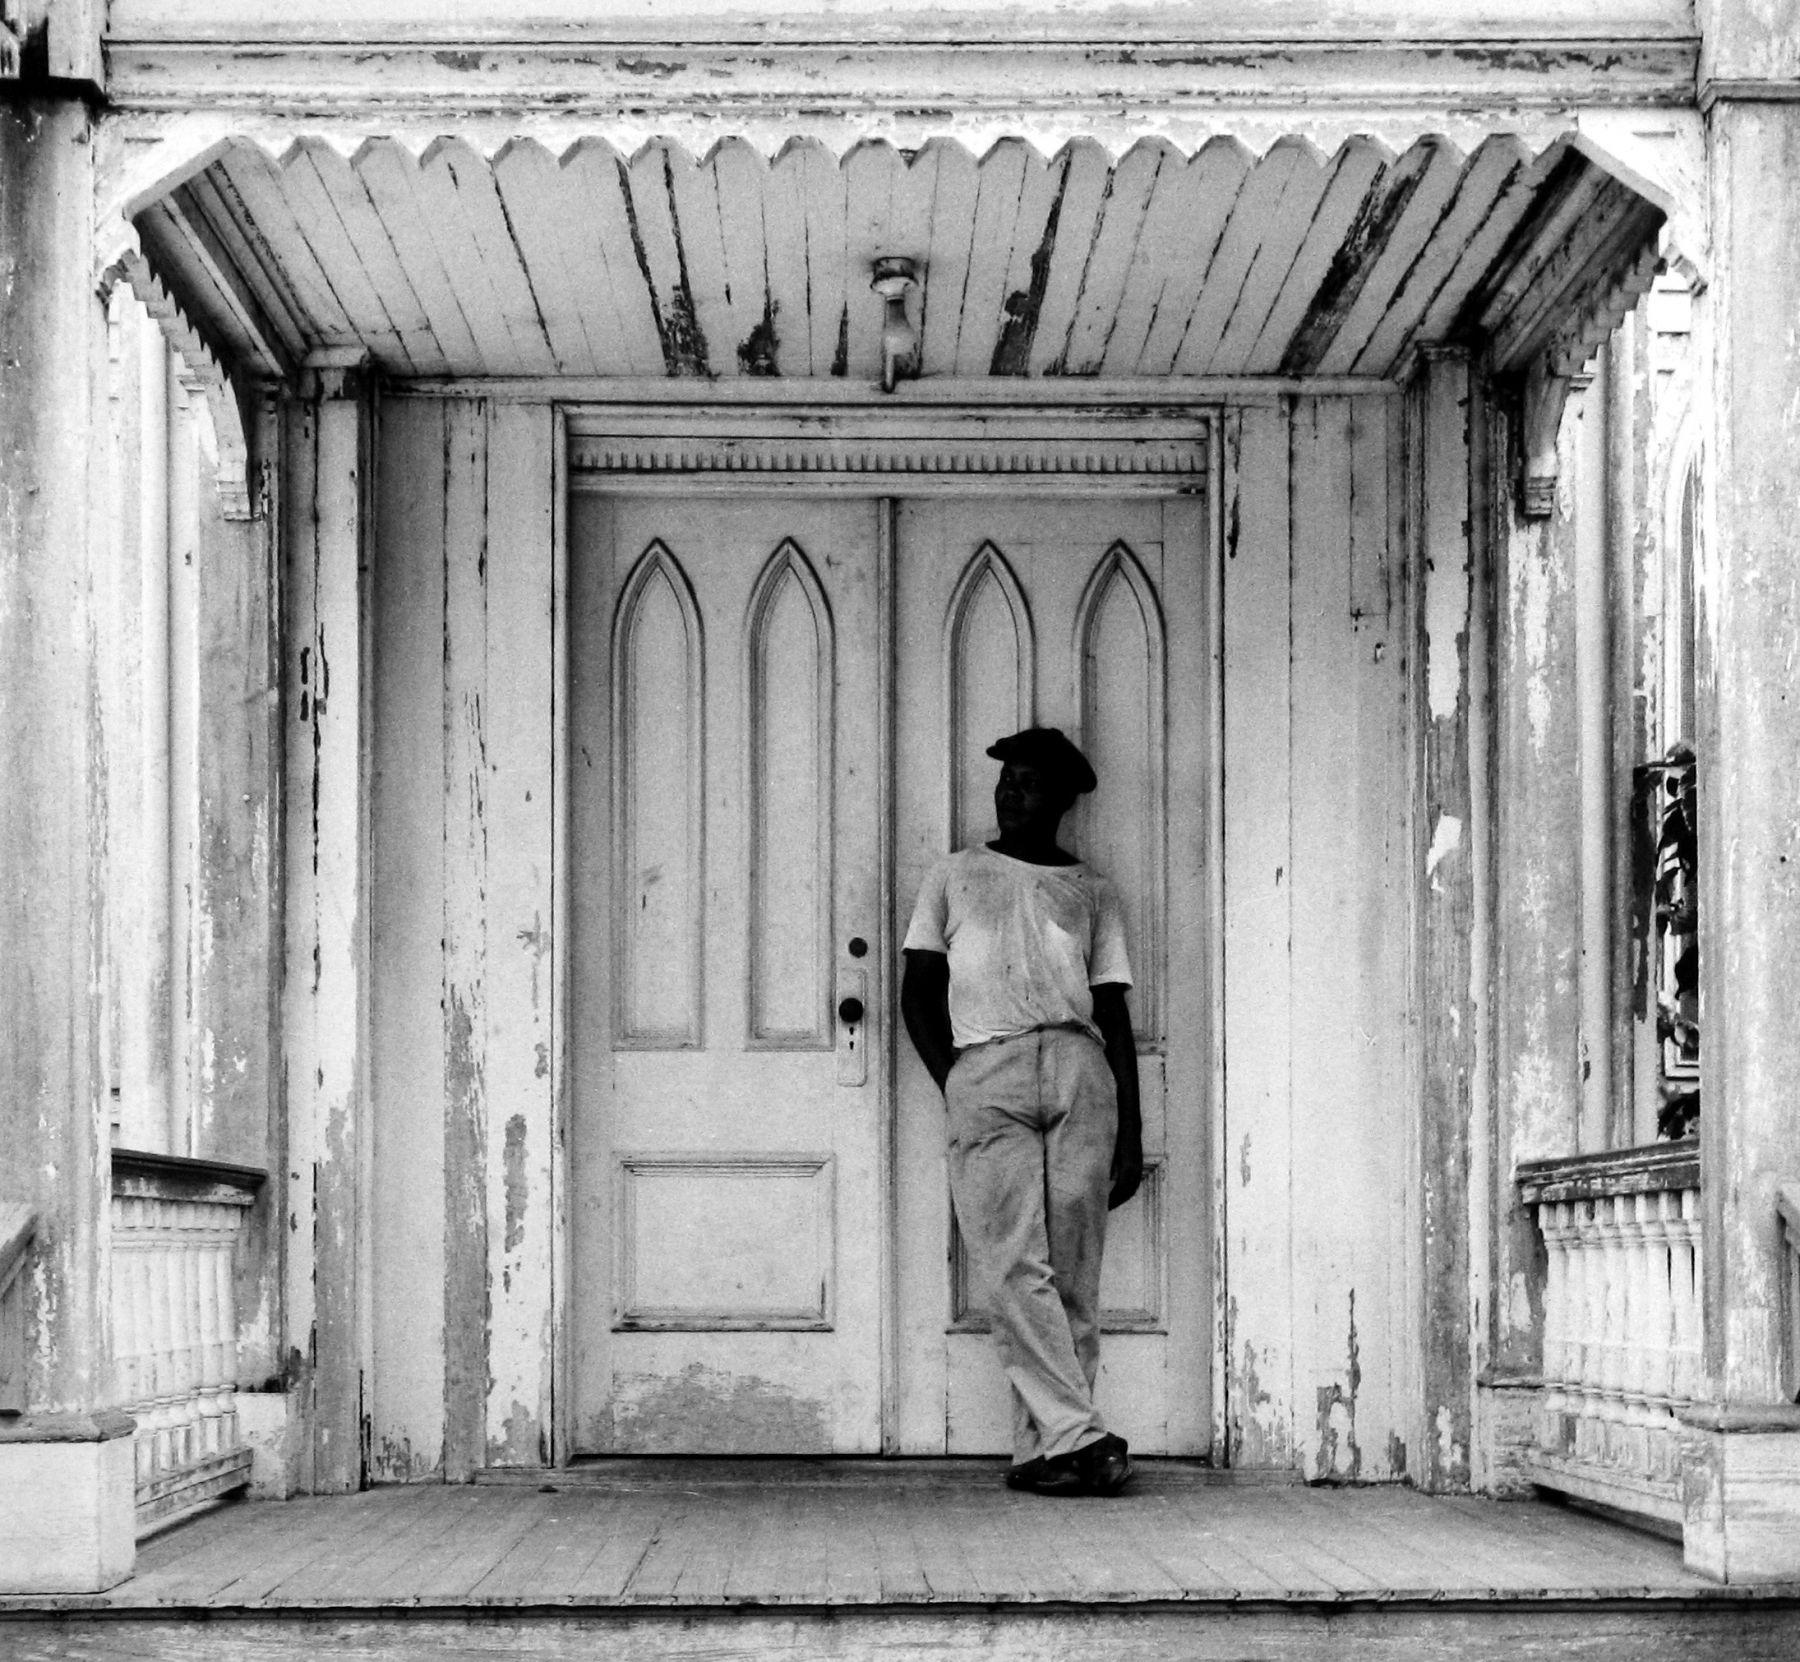 Arnold Newman - Man on Church Porch, West Palm Beach, FL, 1941 - Howard Greenberg Gallery - 2018